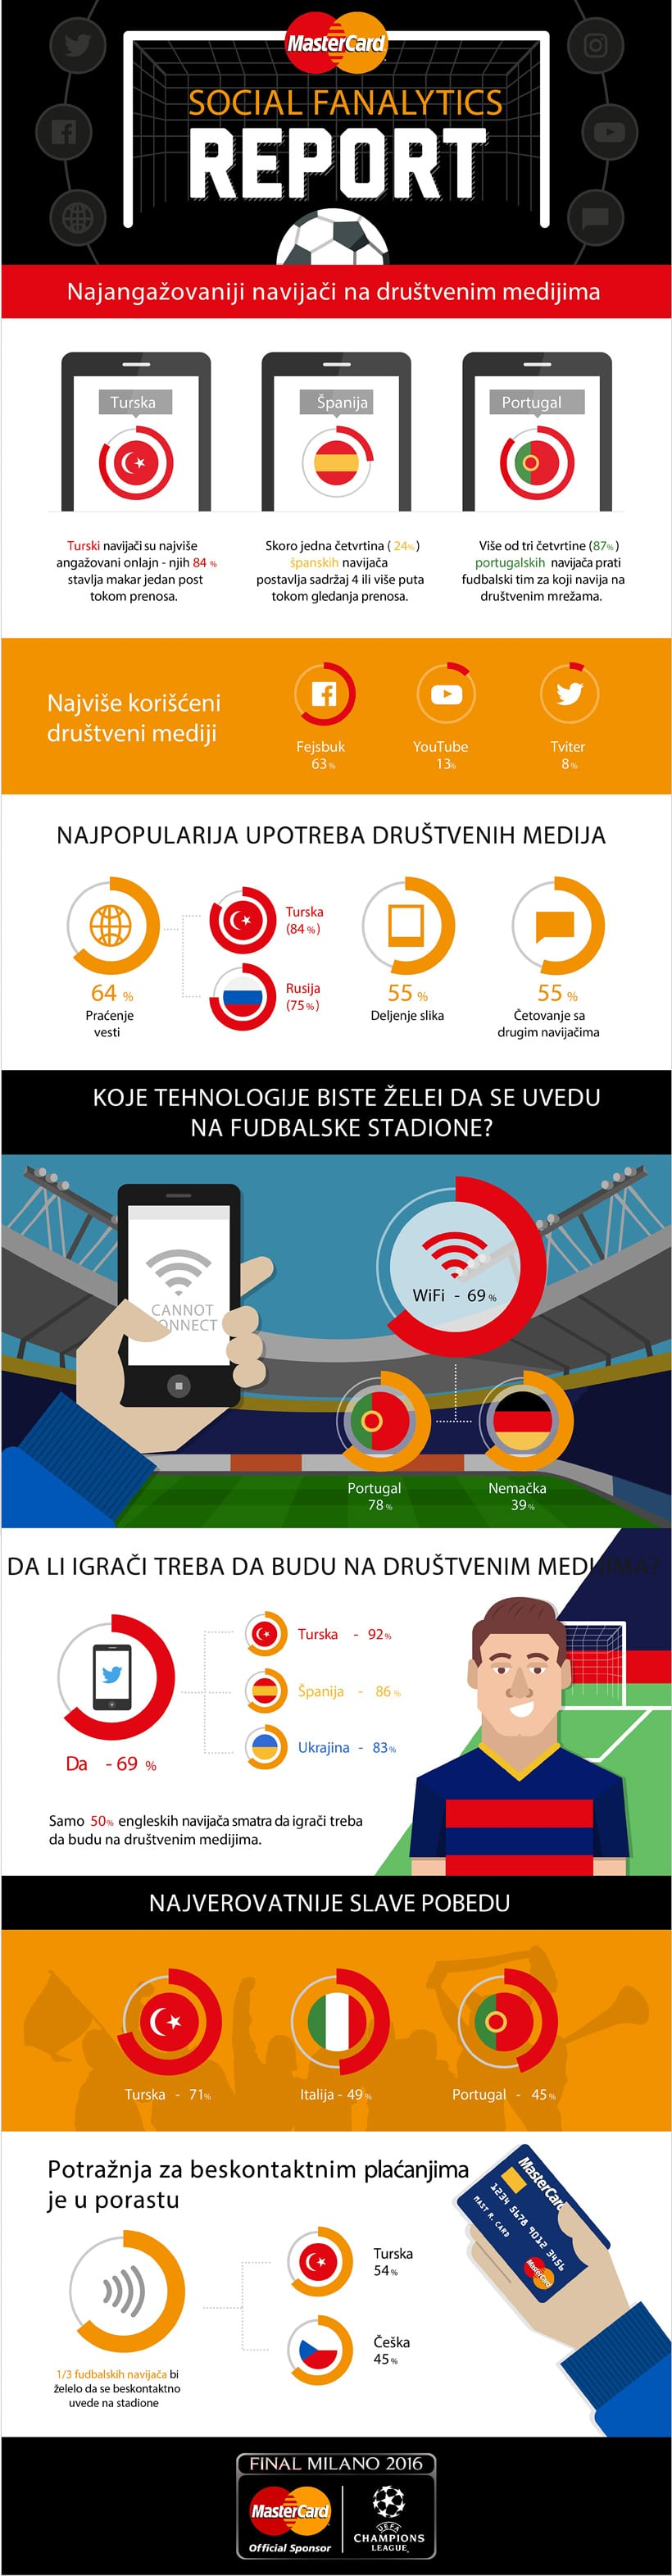 Social-Fanalytics-izveštaj_infografika820